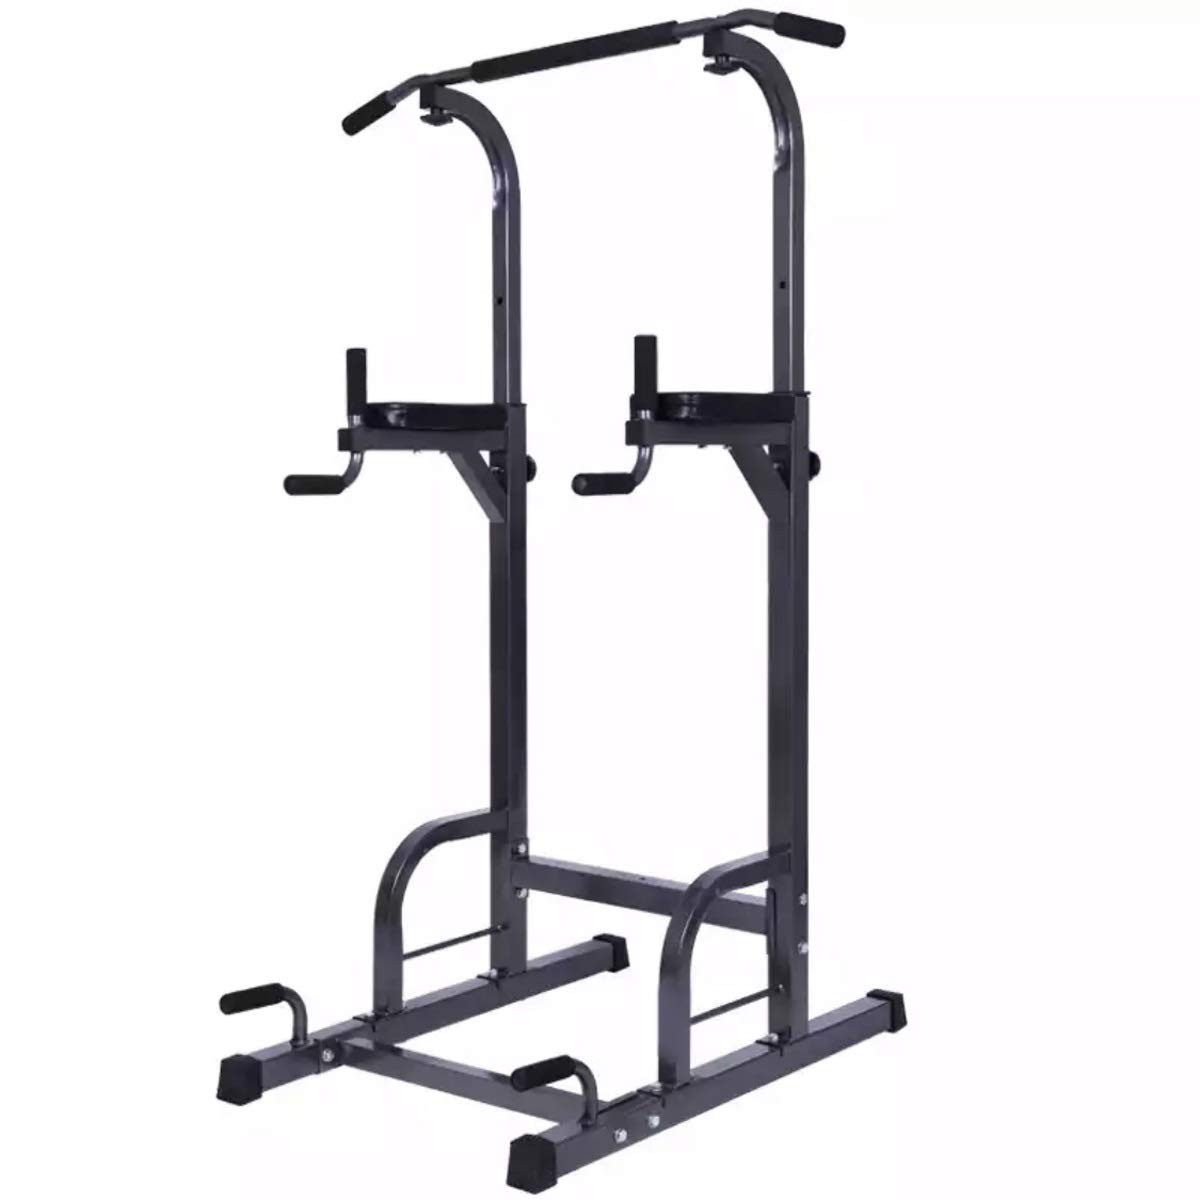 Baianju Home Pull-ups Indoor Multi-Function Fitness Equipment Single-bar Push-ups Home Fitness Equipment by Baianju